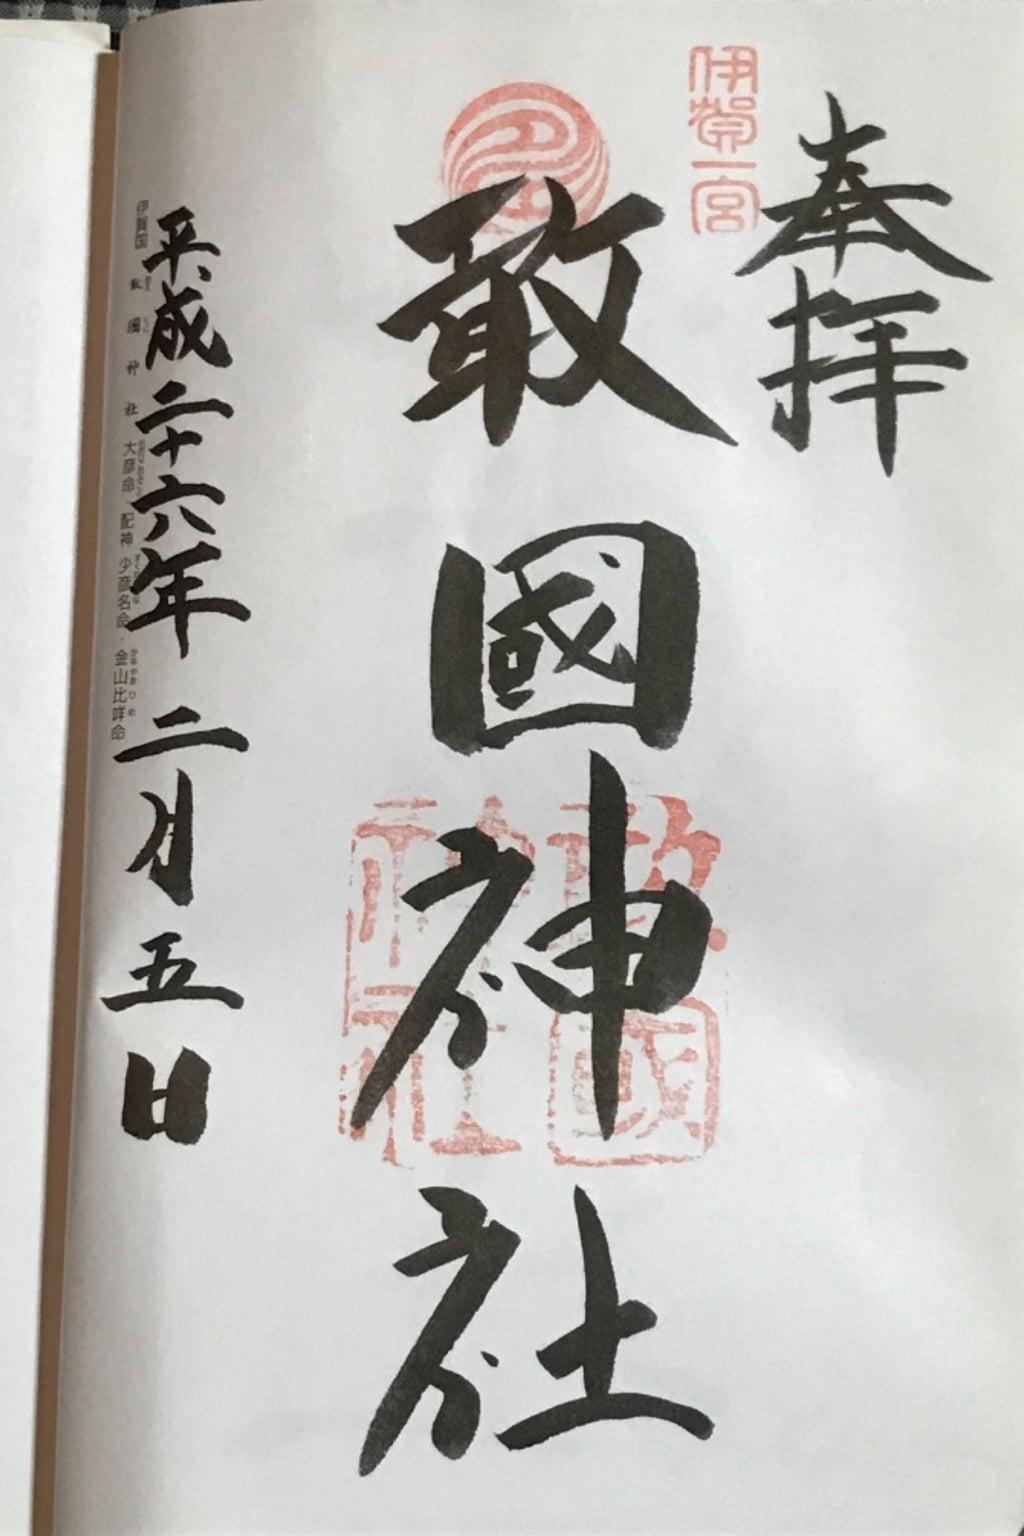 敢國神社の御朱印